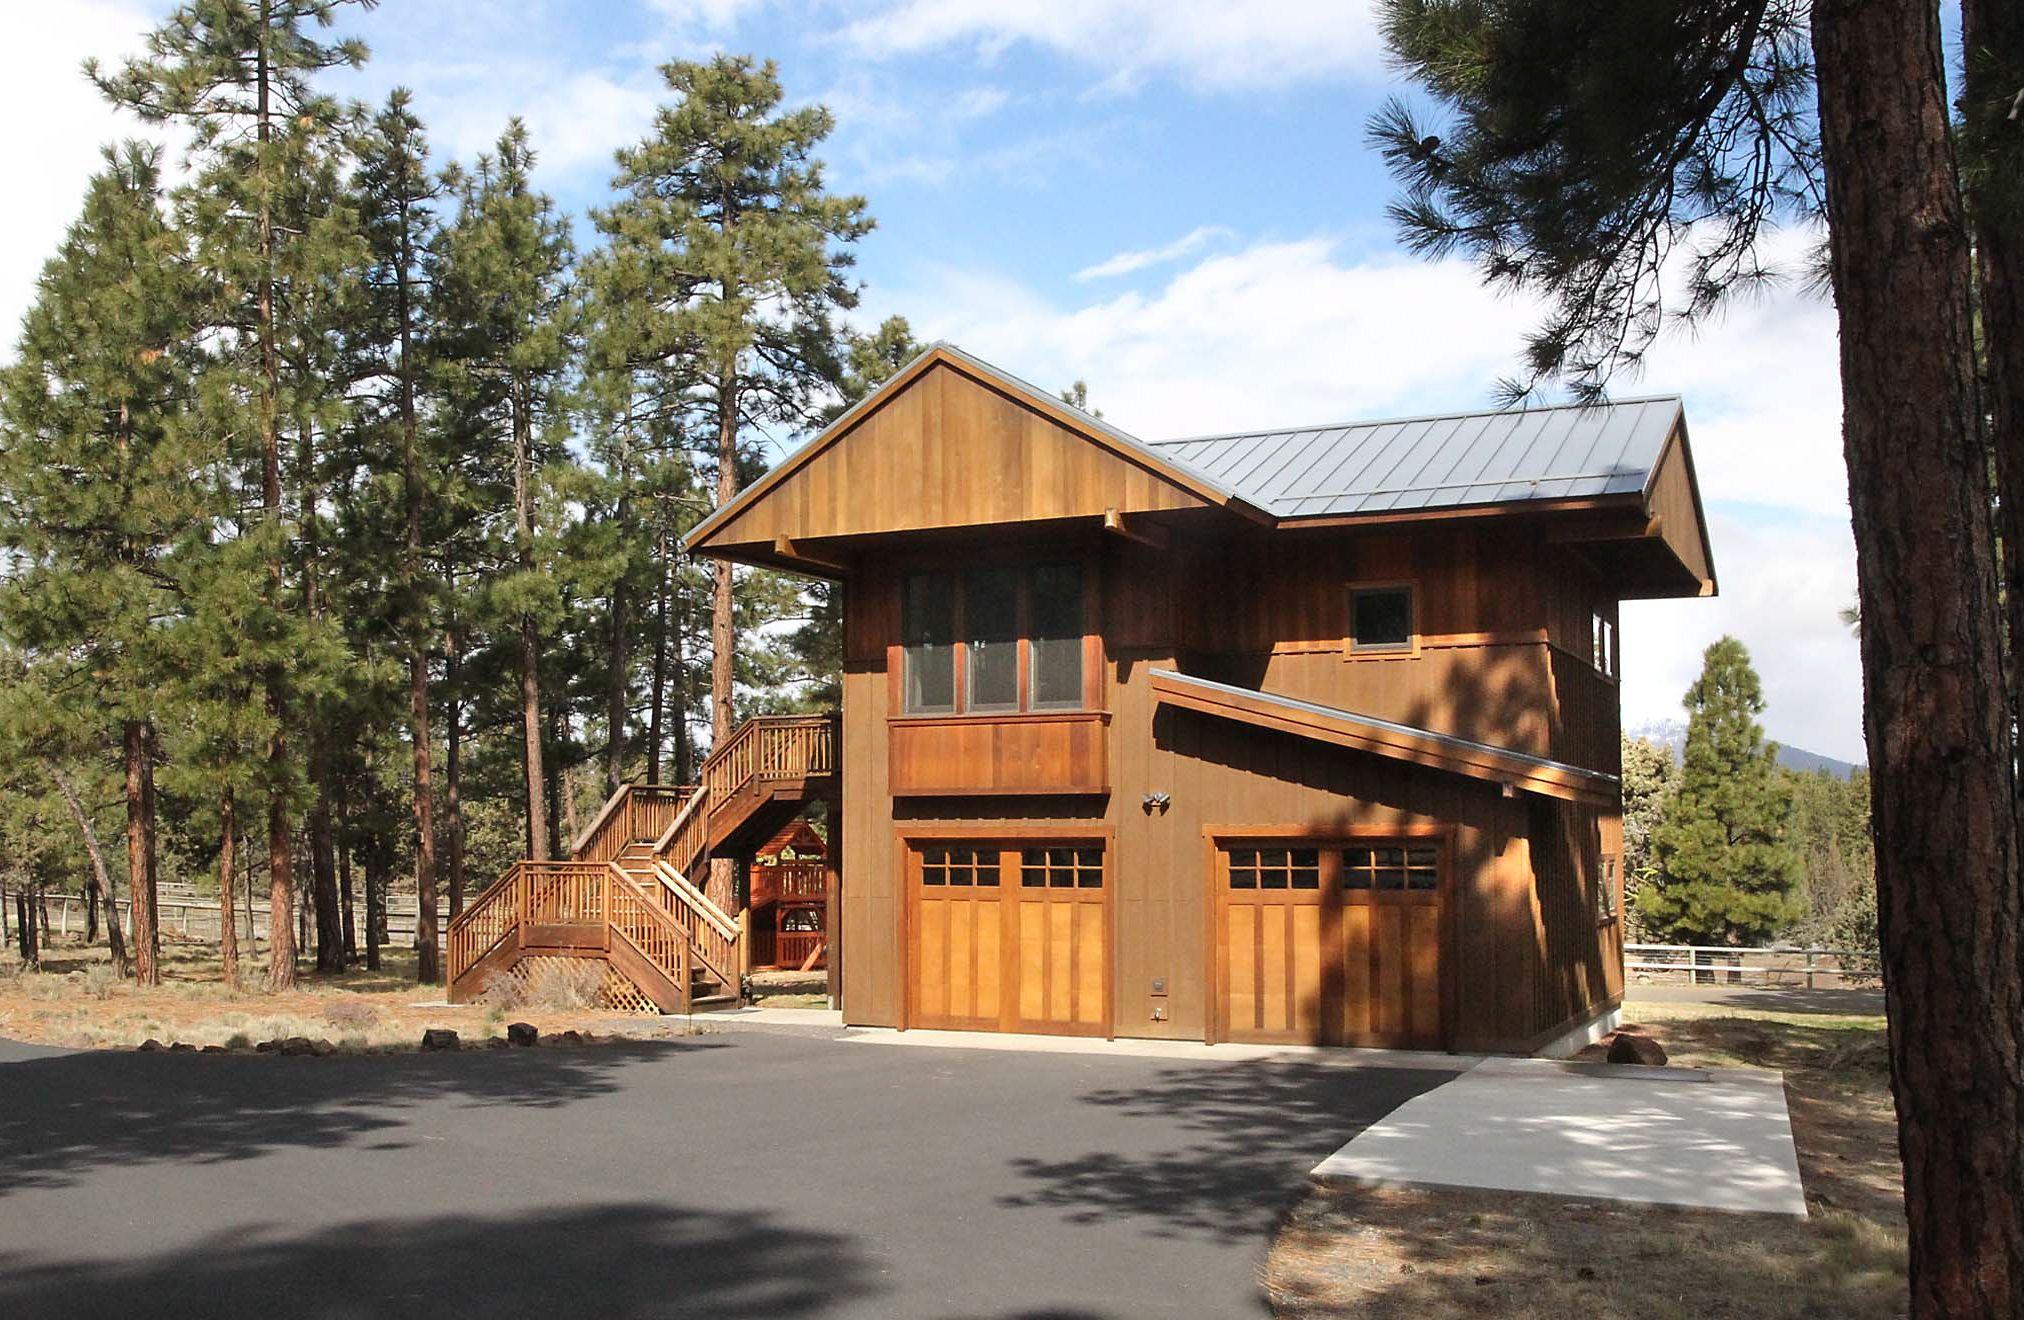 Acreage For Sale in Sisters Oregon | Bill's style board | Garage